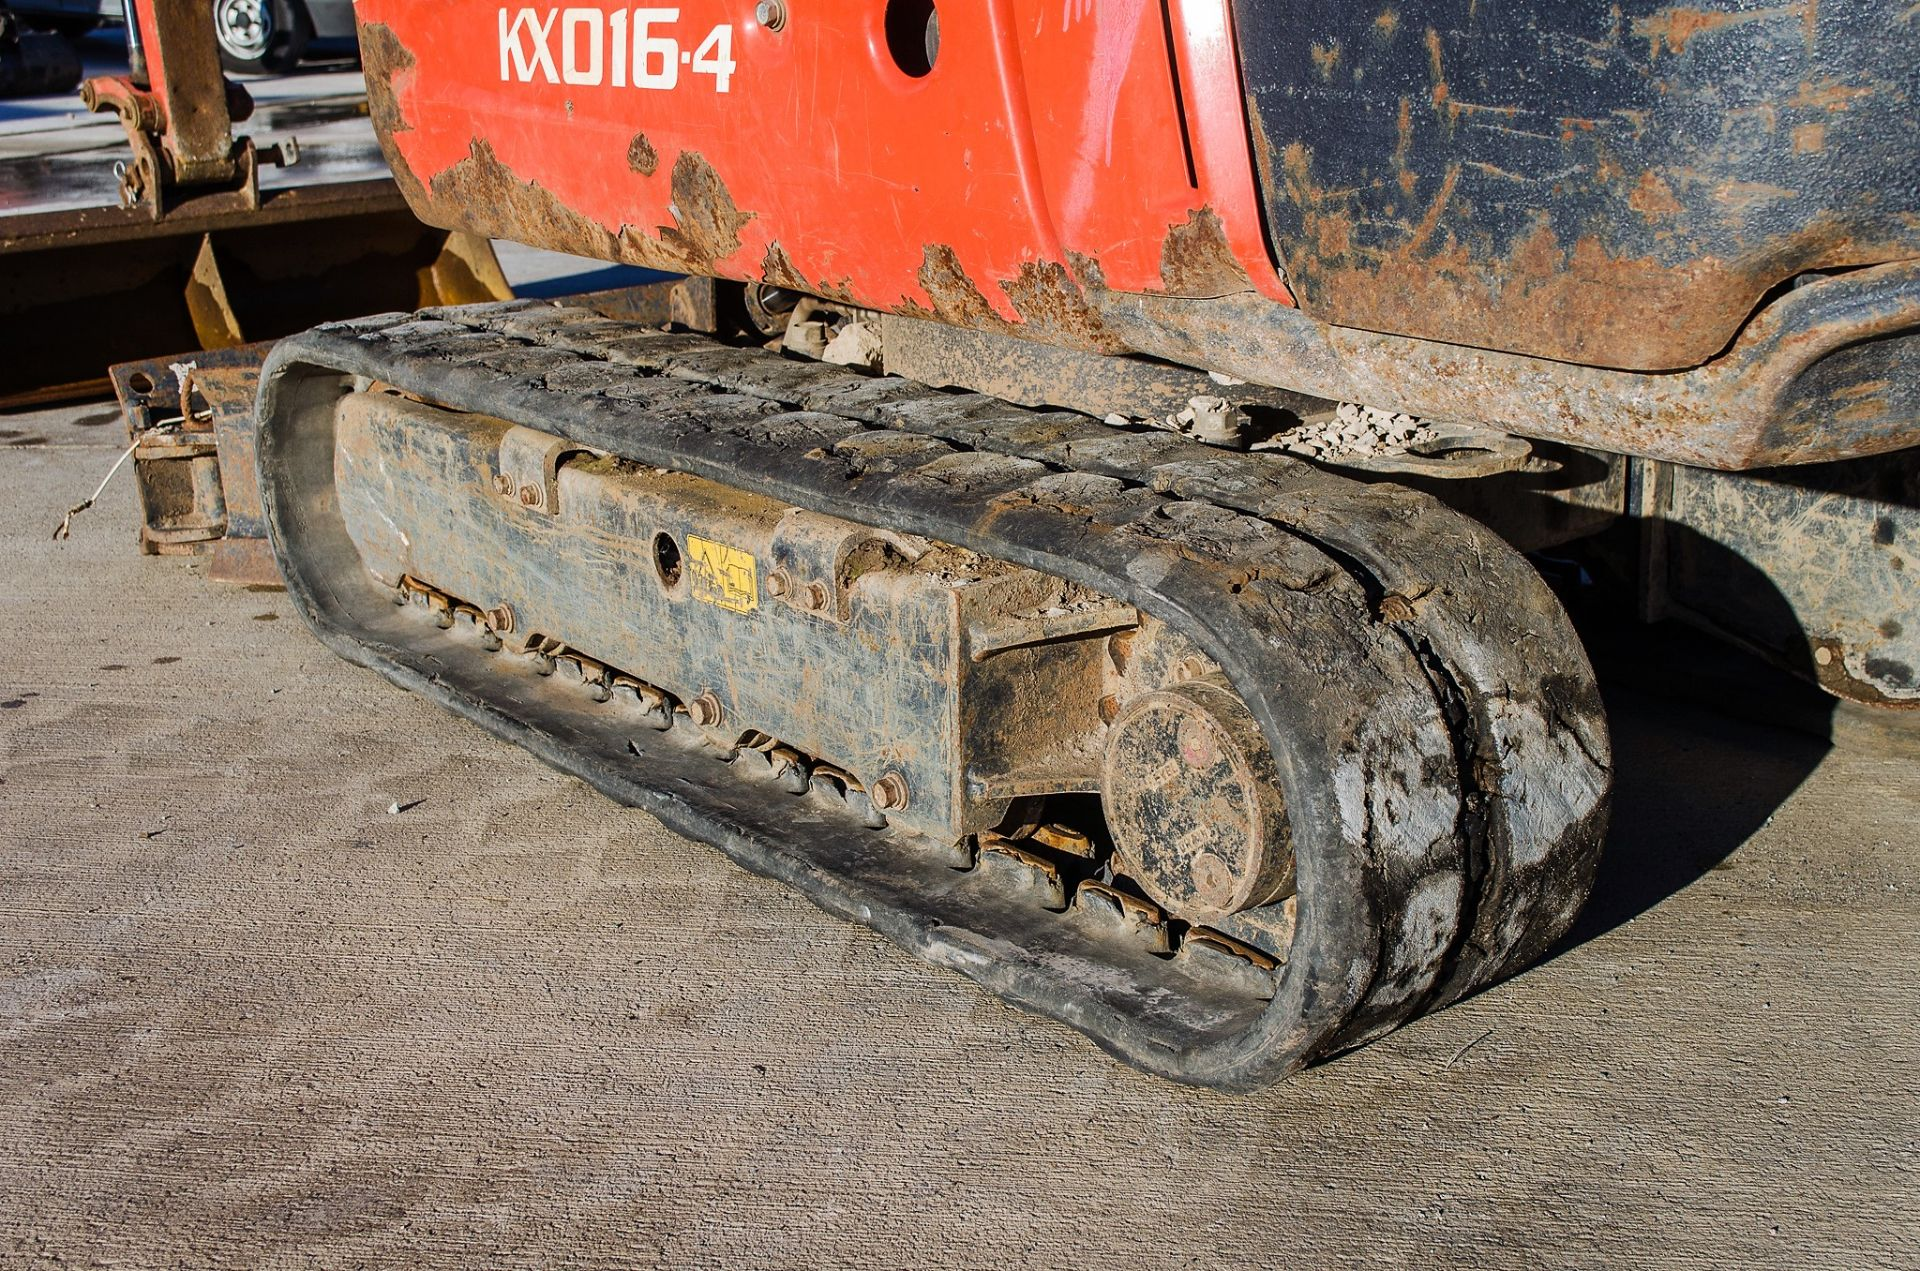 Kubota KX016-4 1.5 tonne rubber tracked mini excavator Year: 2015 S/N: 58688 Recorded Hours: 1736 - Image 9 of 19